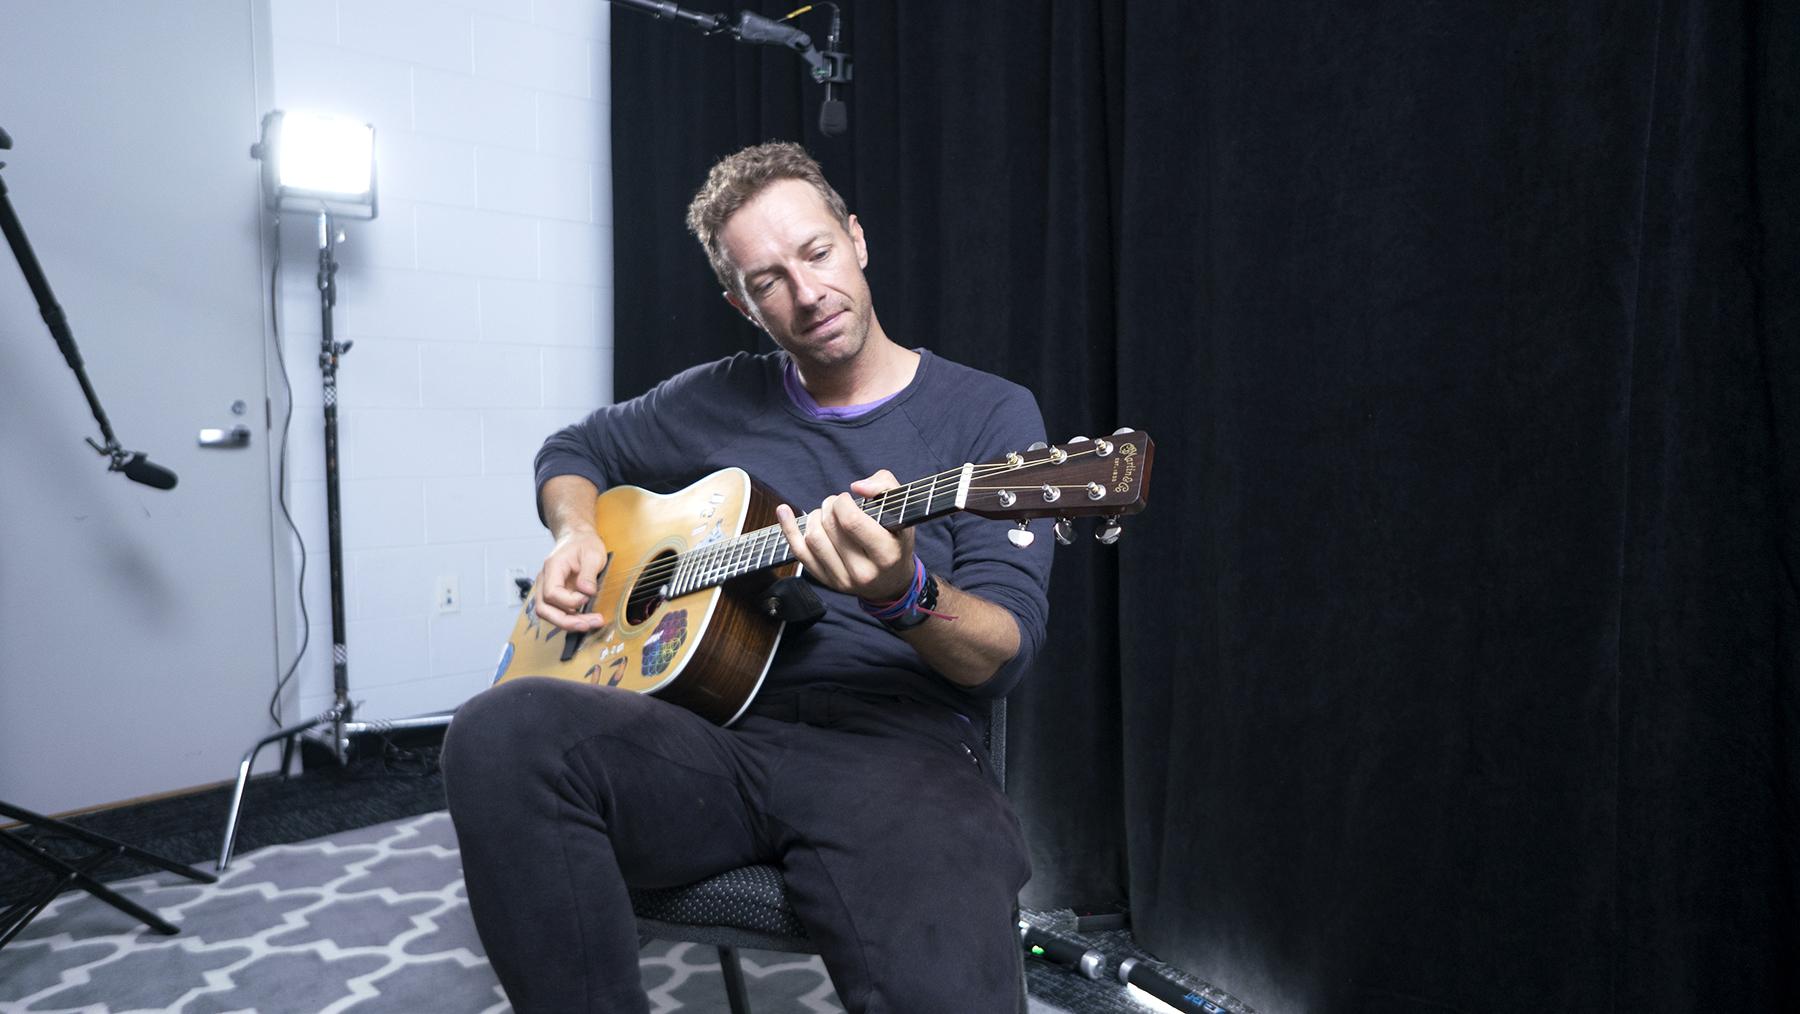 Rockfield - Mais encore - Chris Martin_Coldplay_(c)ie ie productions